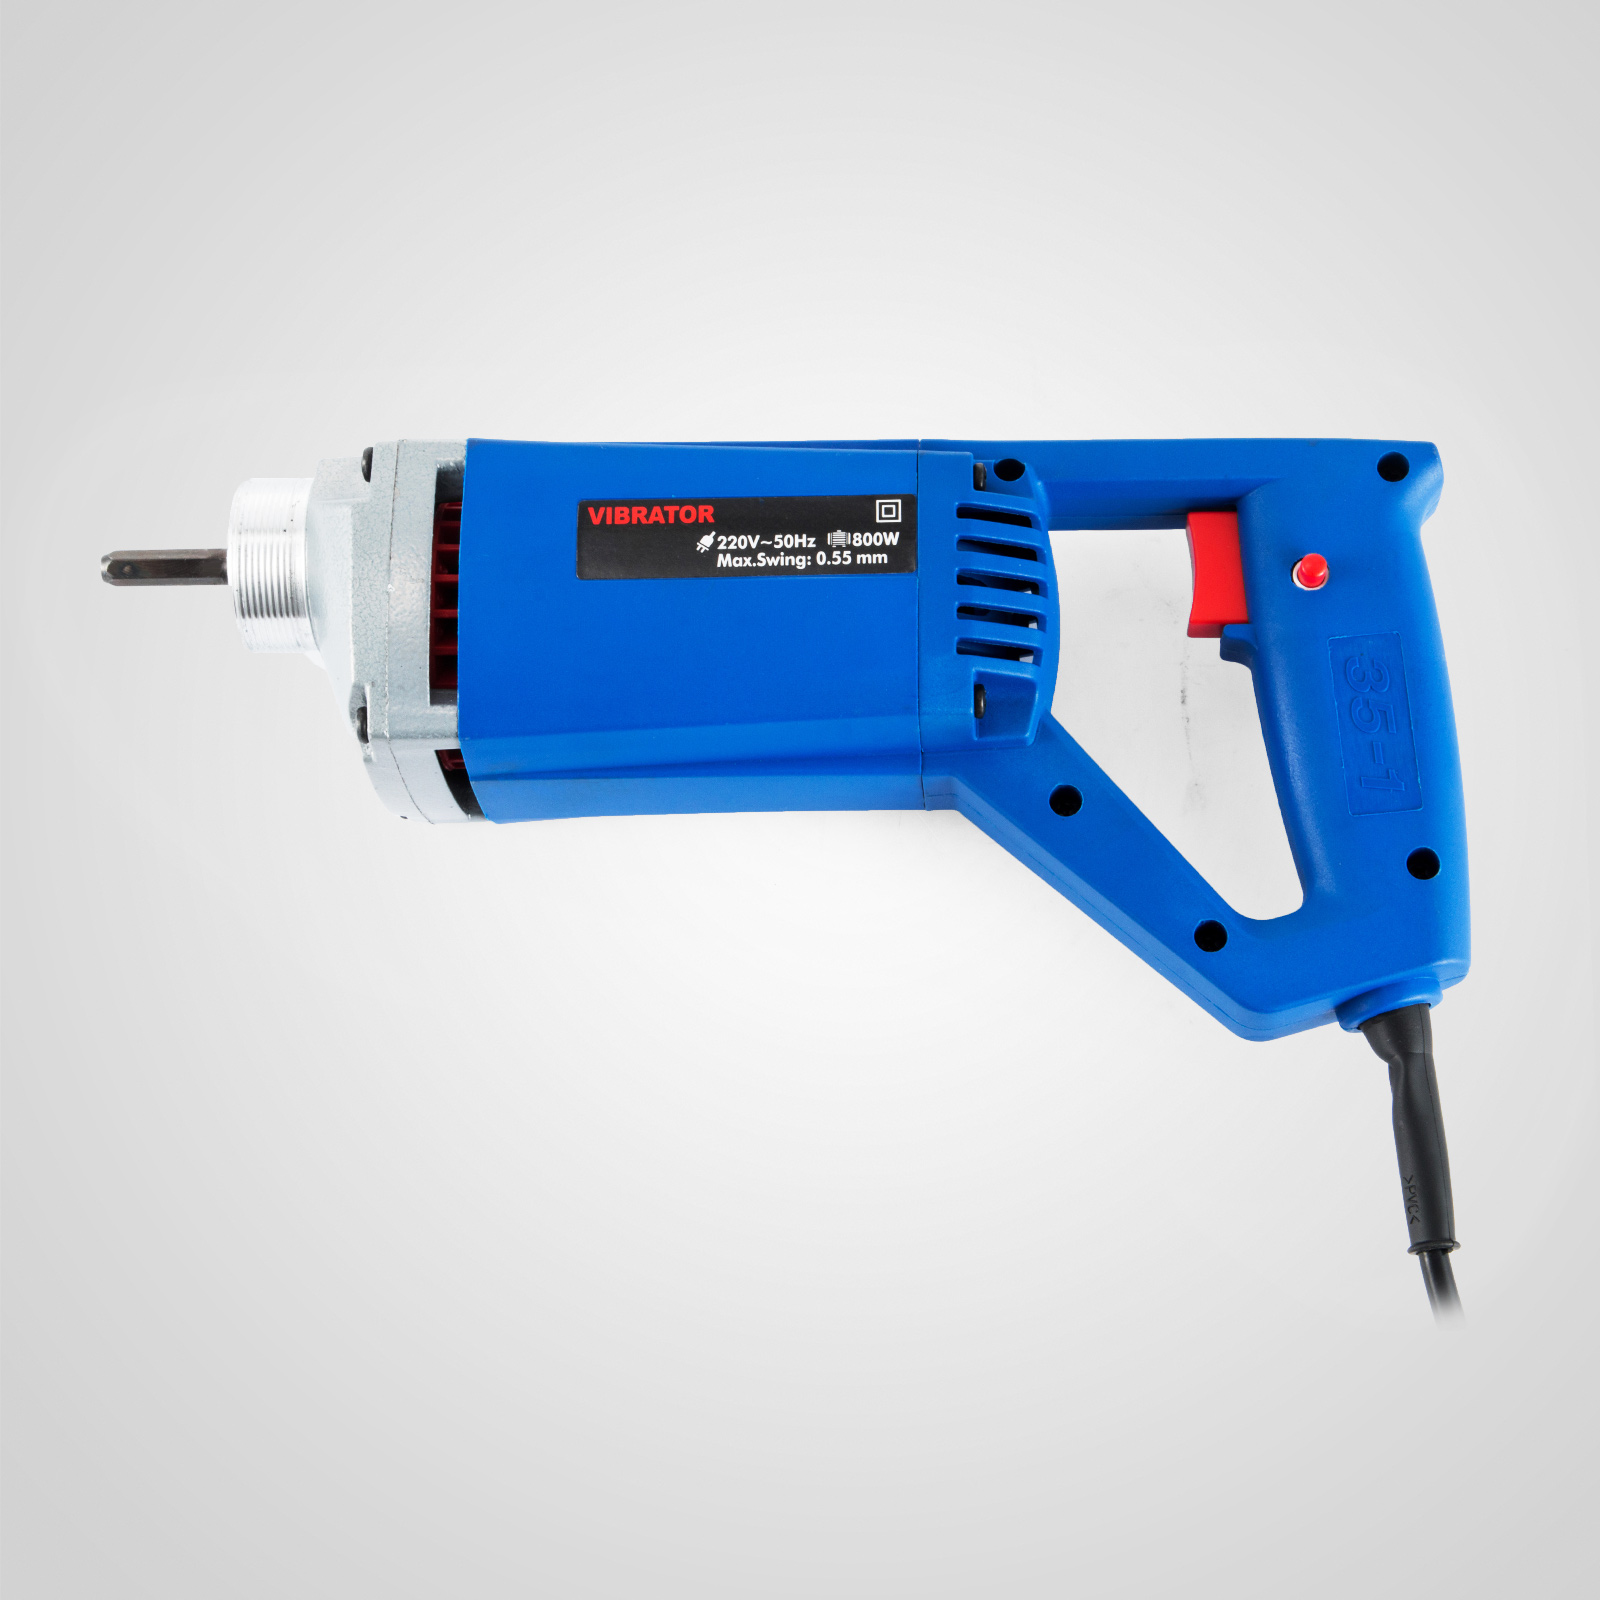 Consider, mains powered vibrator 240v you have